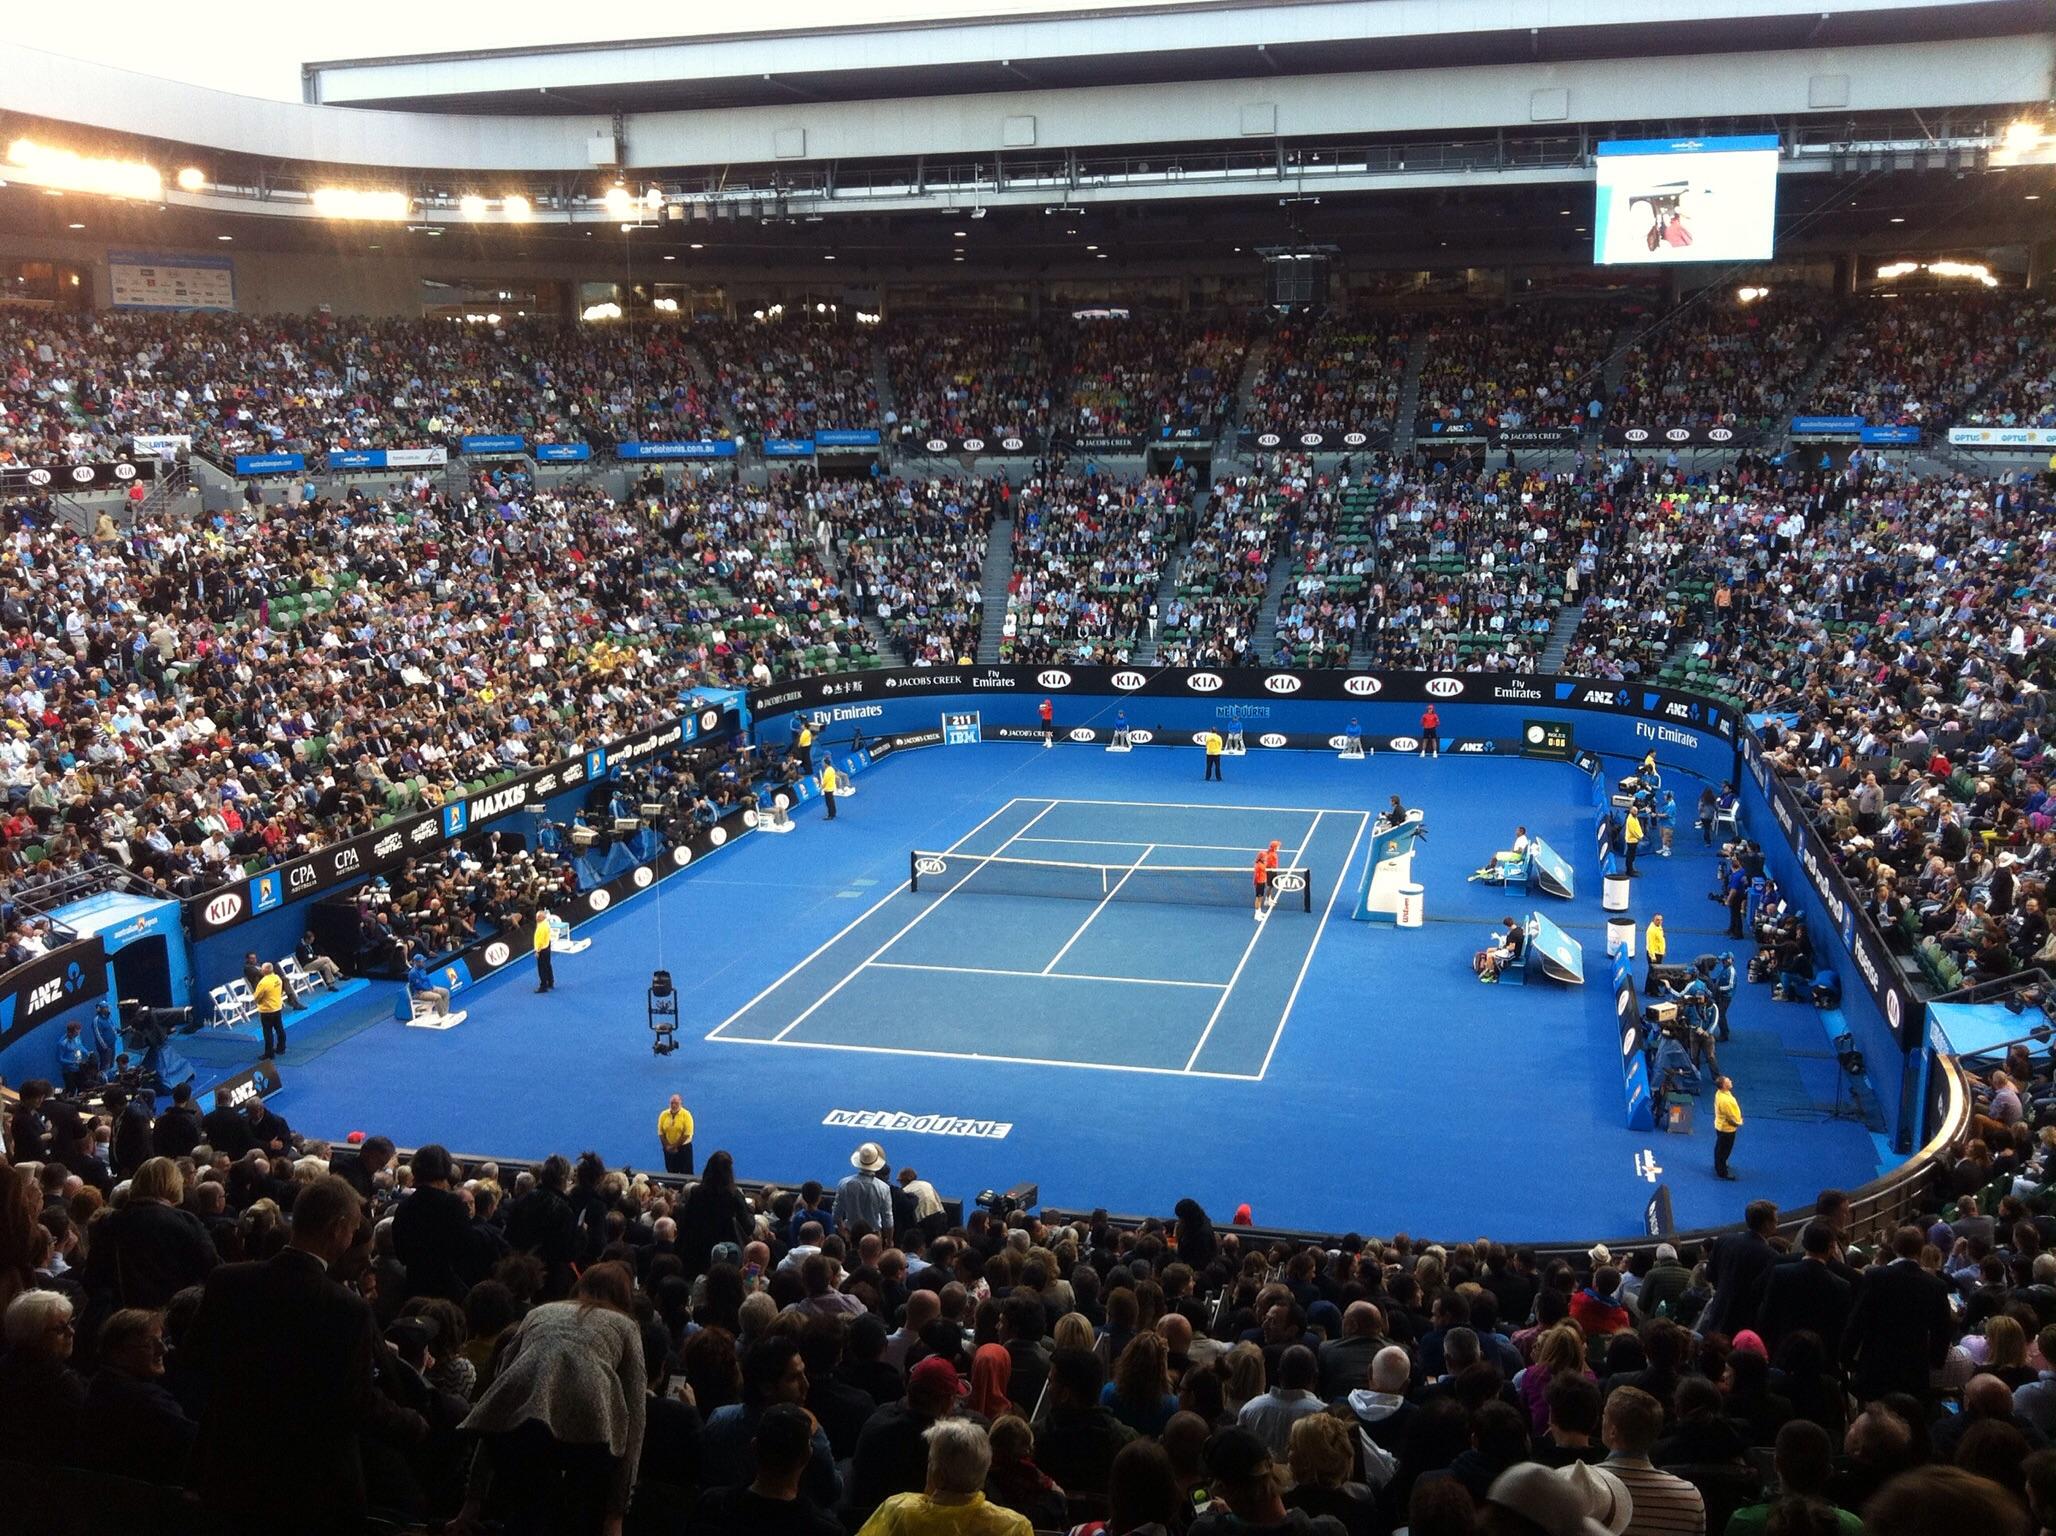 home4magdalf1public_htmltennislifemag.comwp-contentuploads202010echoRod_Laver_Arena_2015_Australian_Open.jpg